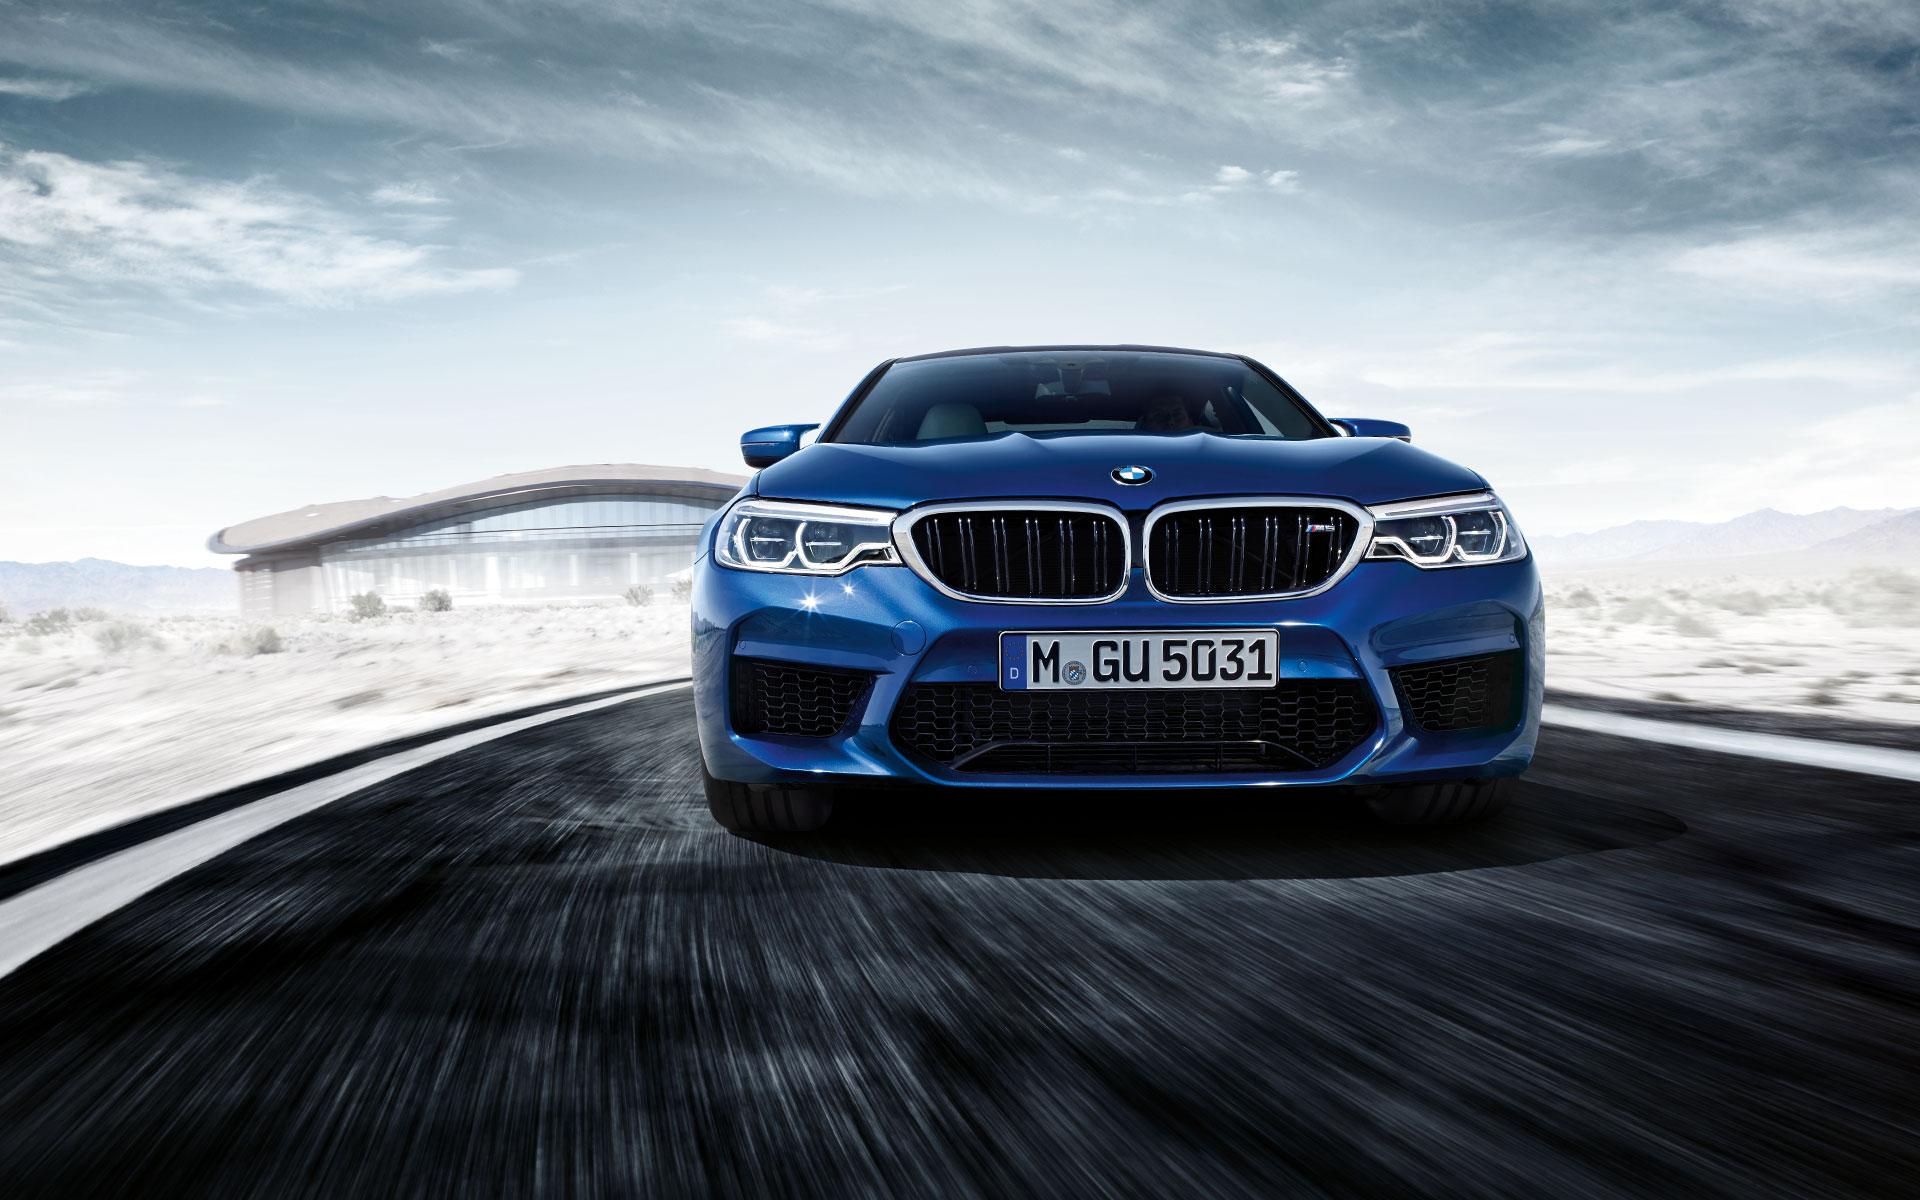 2019 BMW M5 Front blue color 4k hd wallpaper - Latest Cars 2018-2019